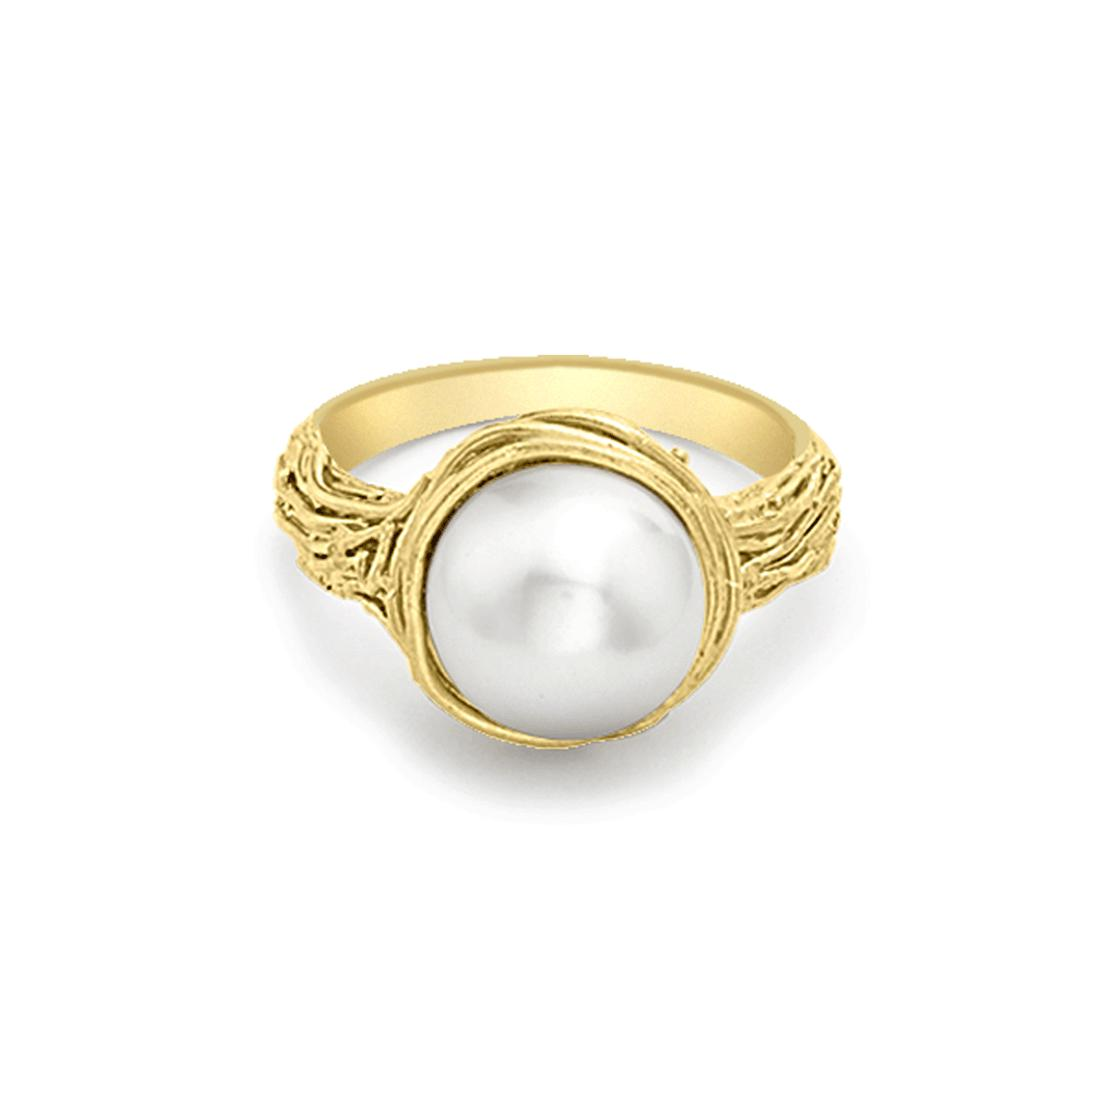 London Road Jewellery Designer White Gold Multi Colour Ball Ring Trio - UK L - US 5 1/2 - EU 51 3/4 oUp5X4s